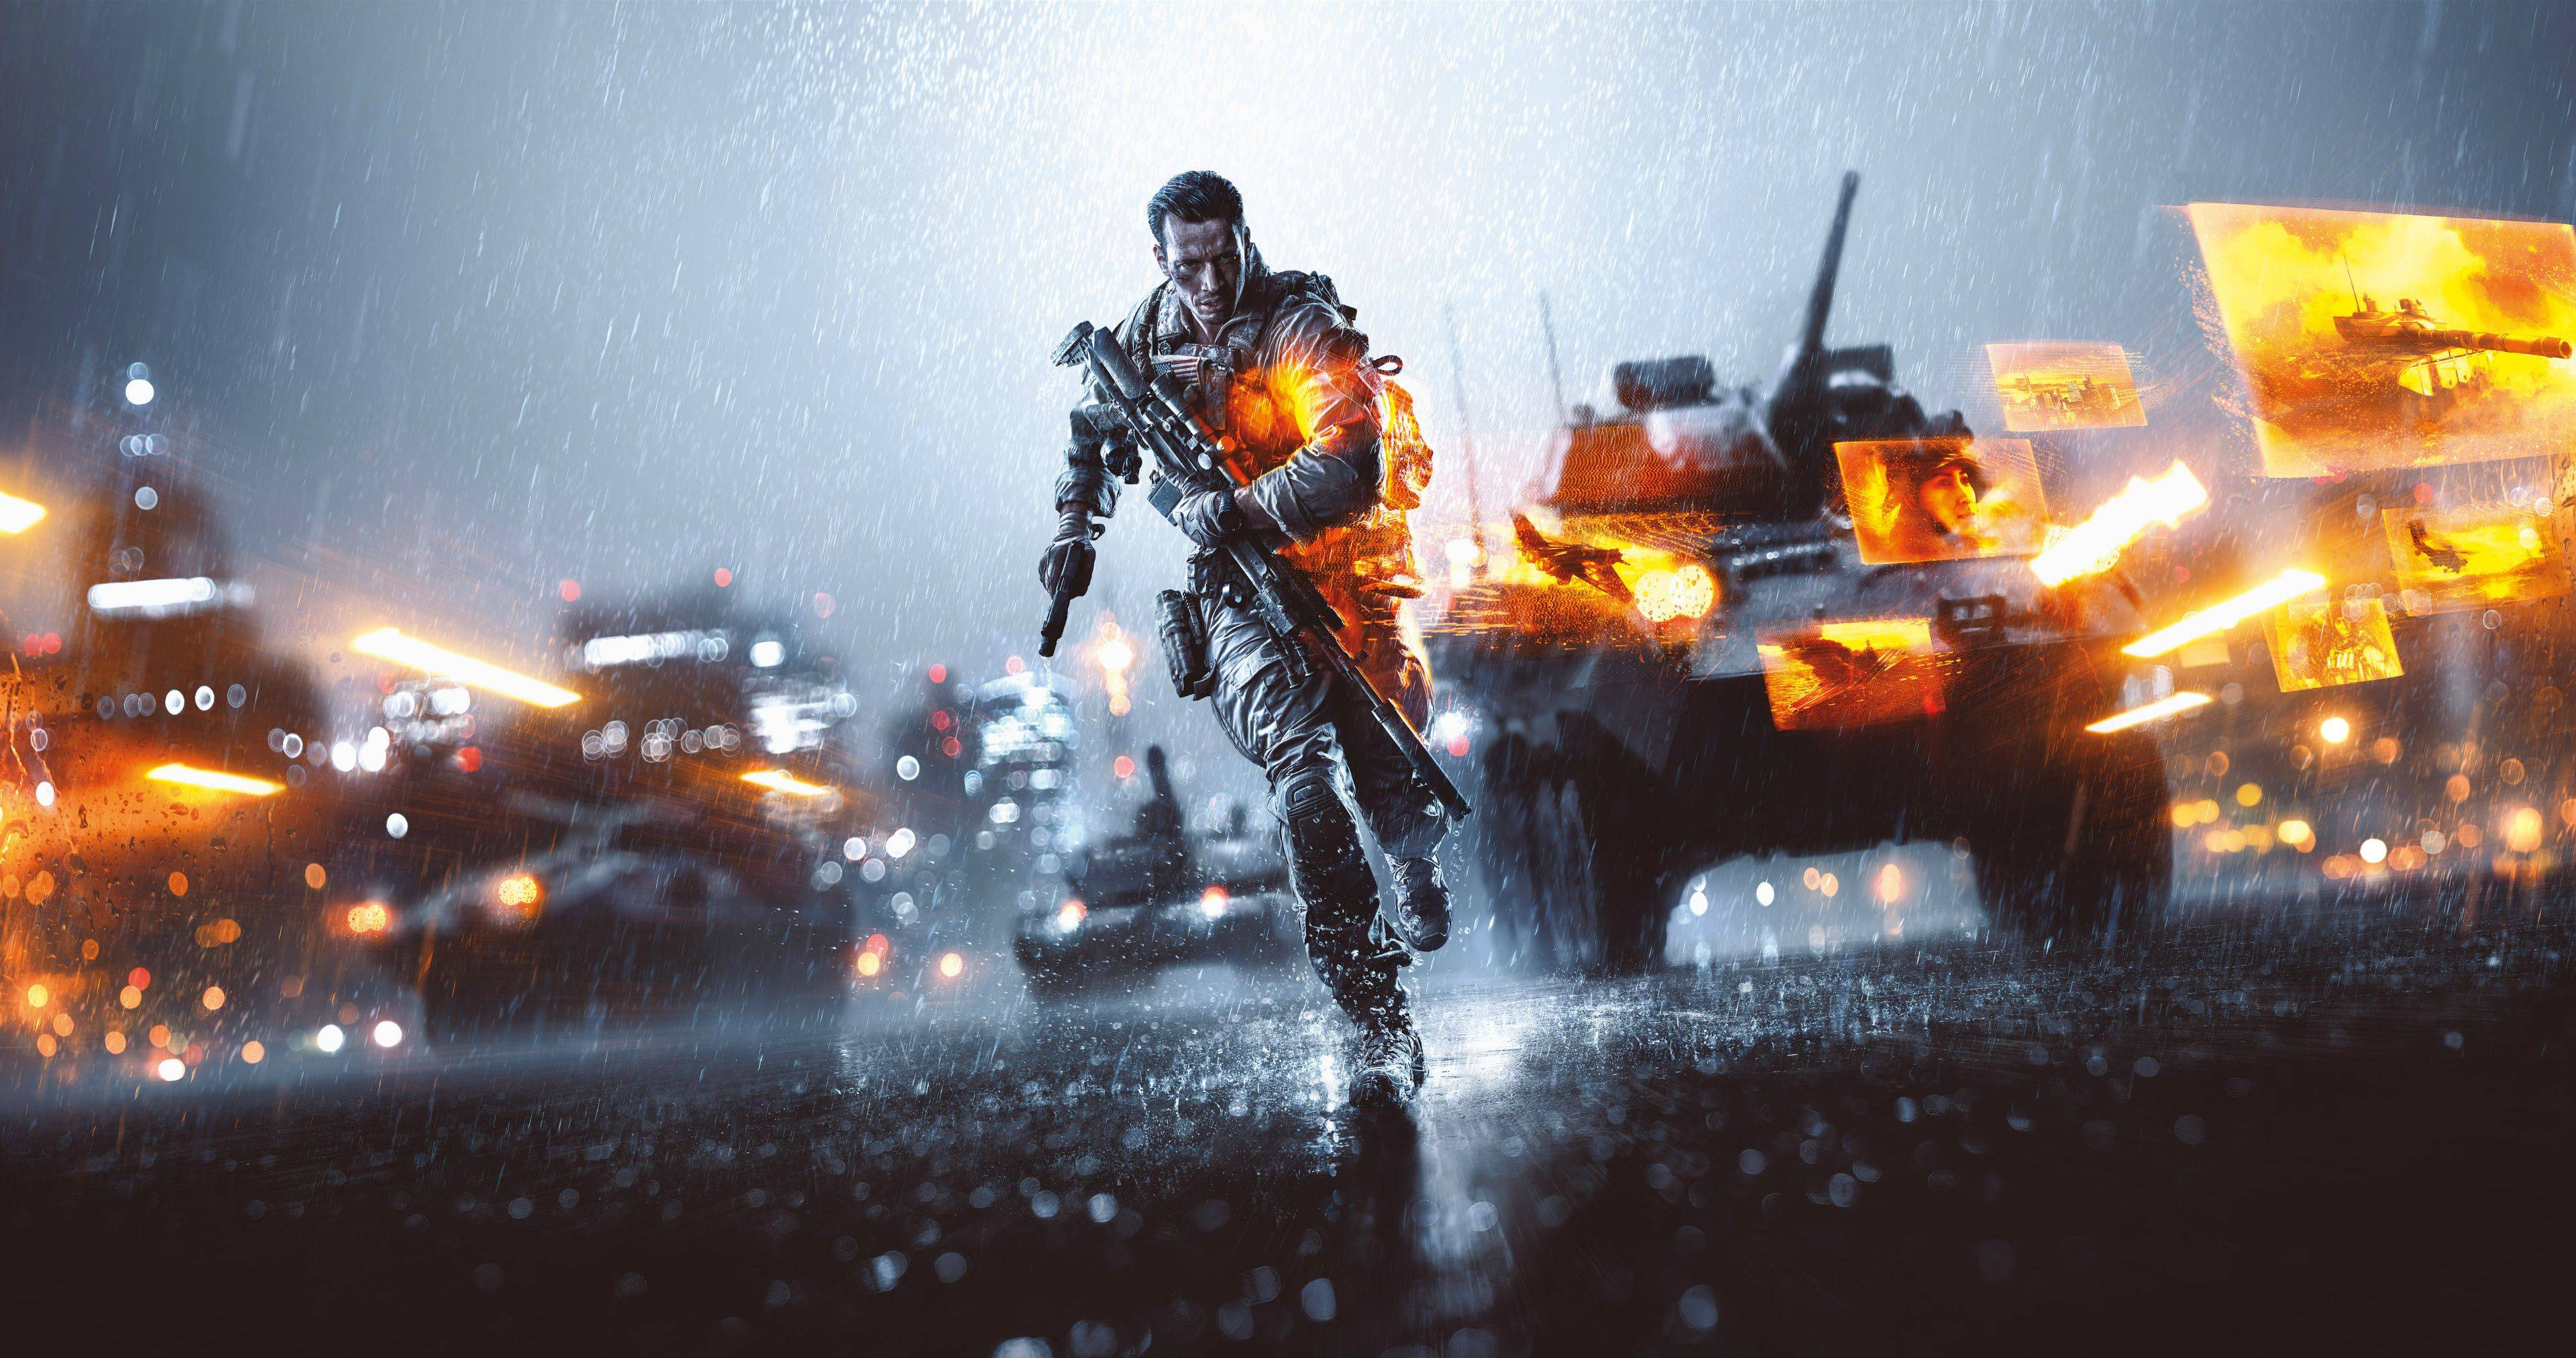 Official Battlefield 4 wallpaper in stunning 5K resolution 3840x2025